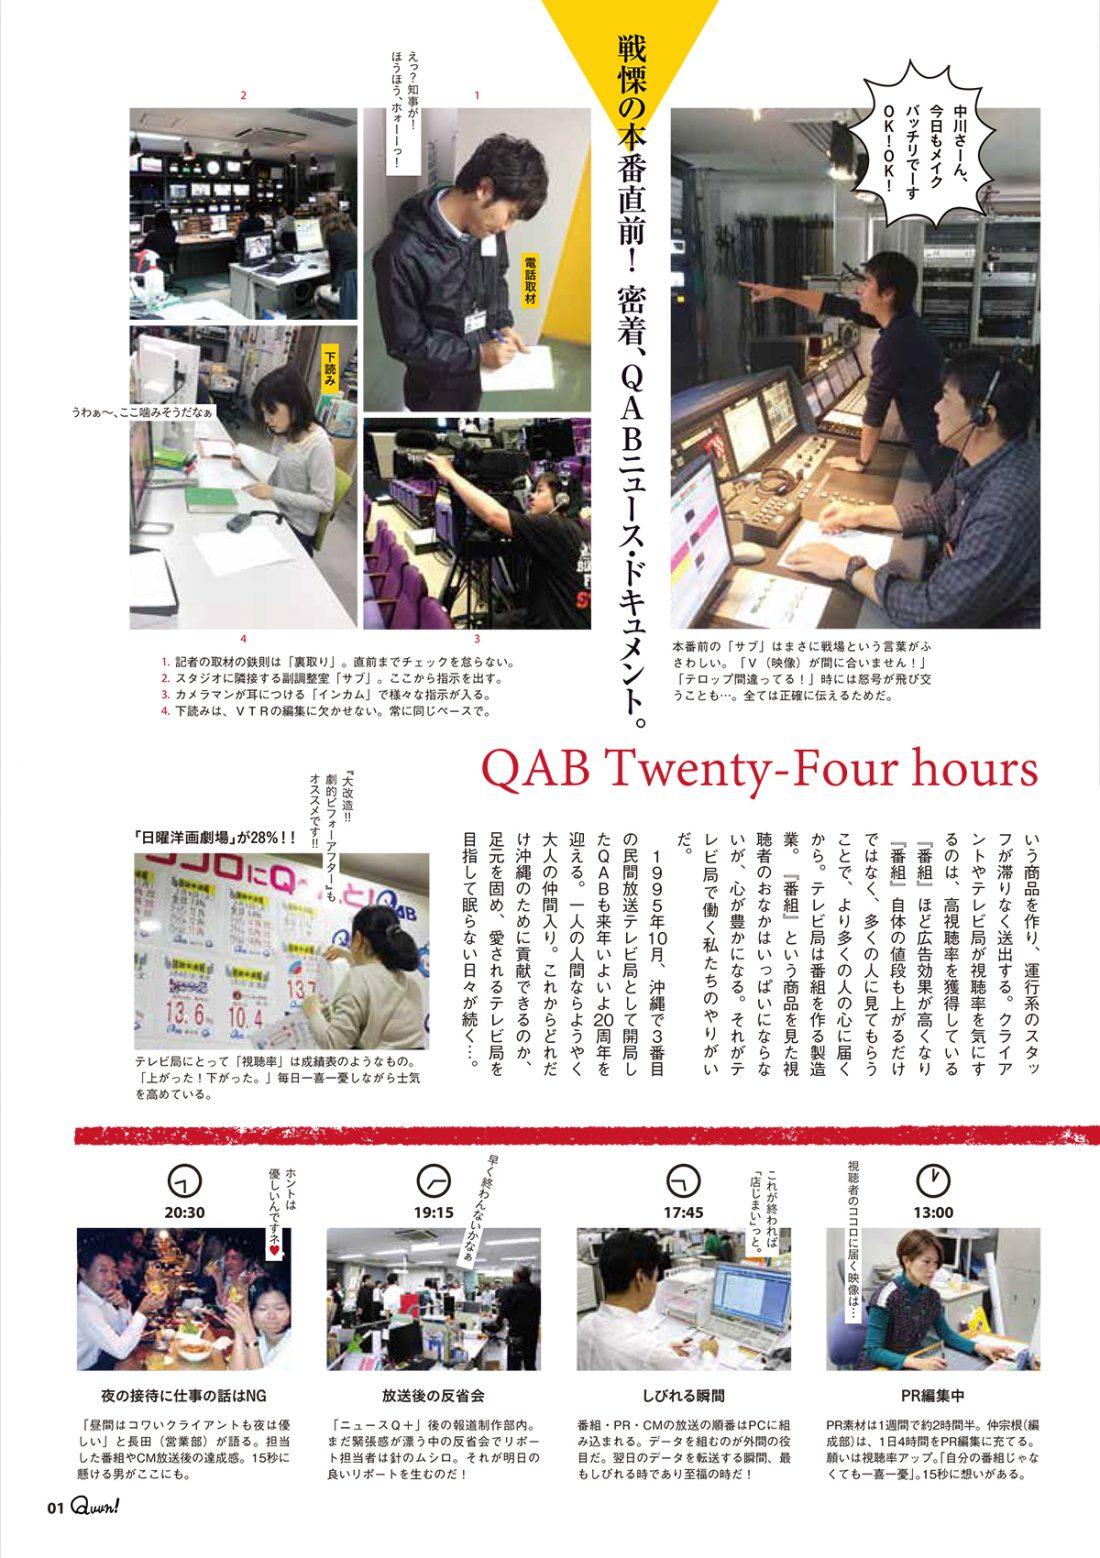 http://www.qab.co.jp/qgoro/wp-content/uploads/quun_0103-1100x1558.jpg